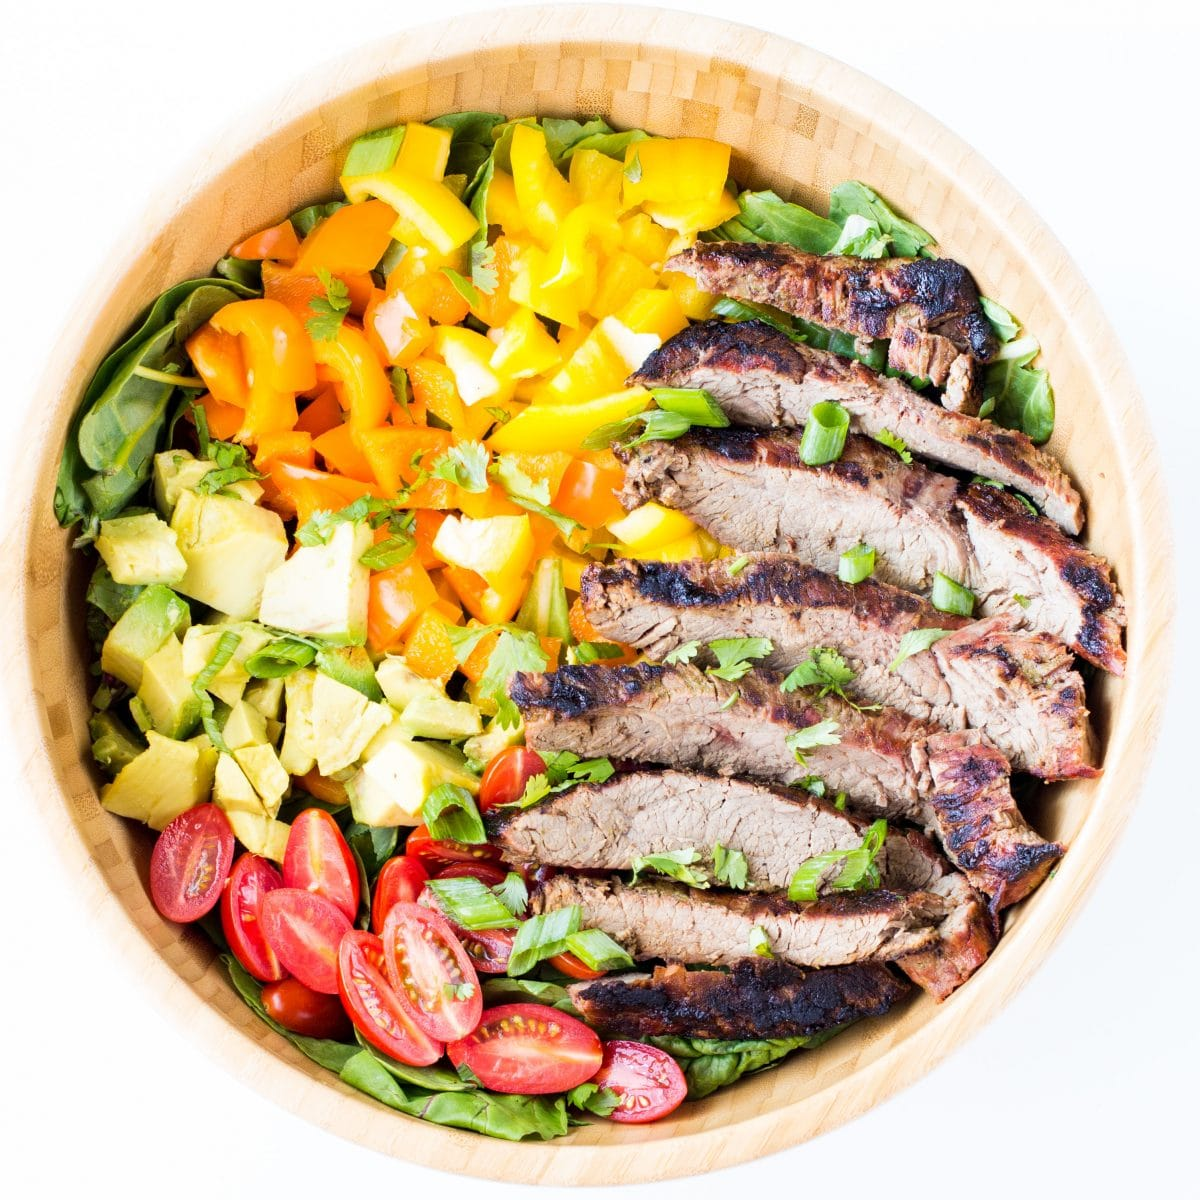 flank-steak-salad-carne-asada-salad